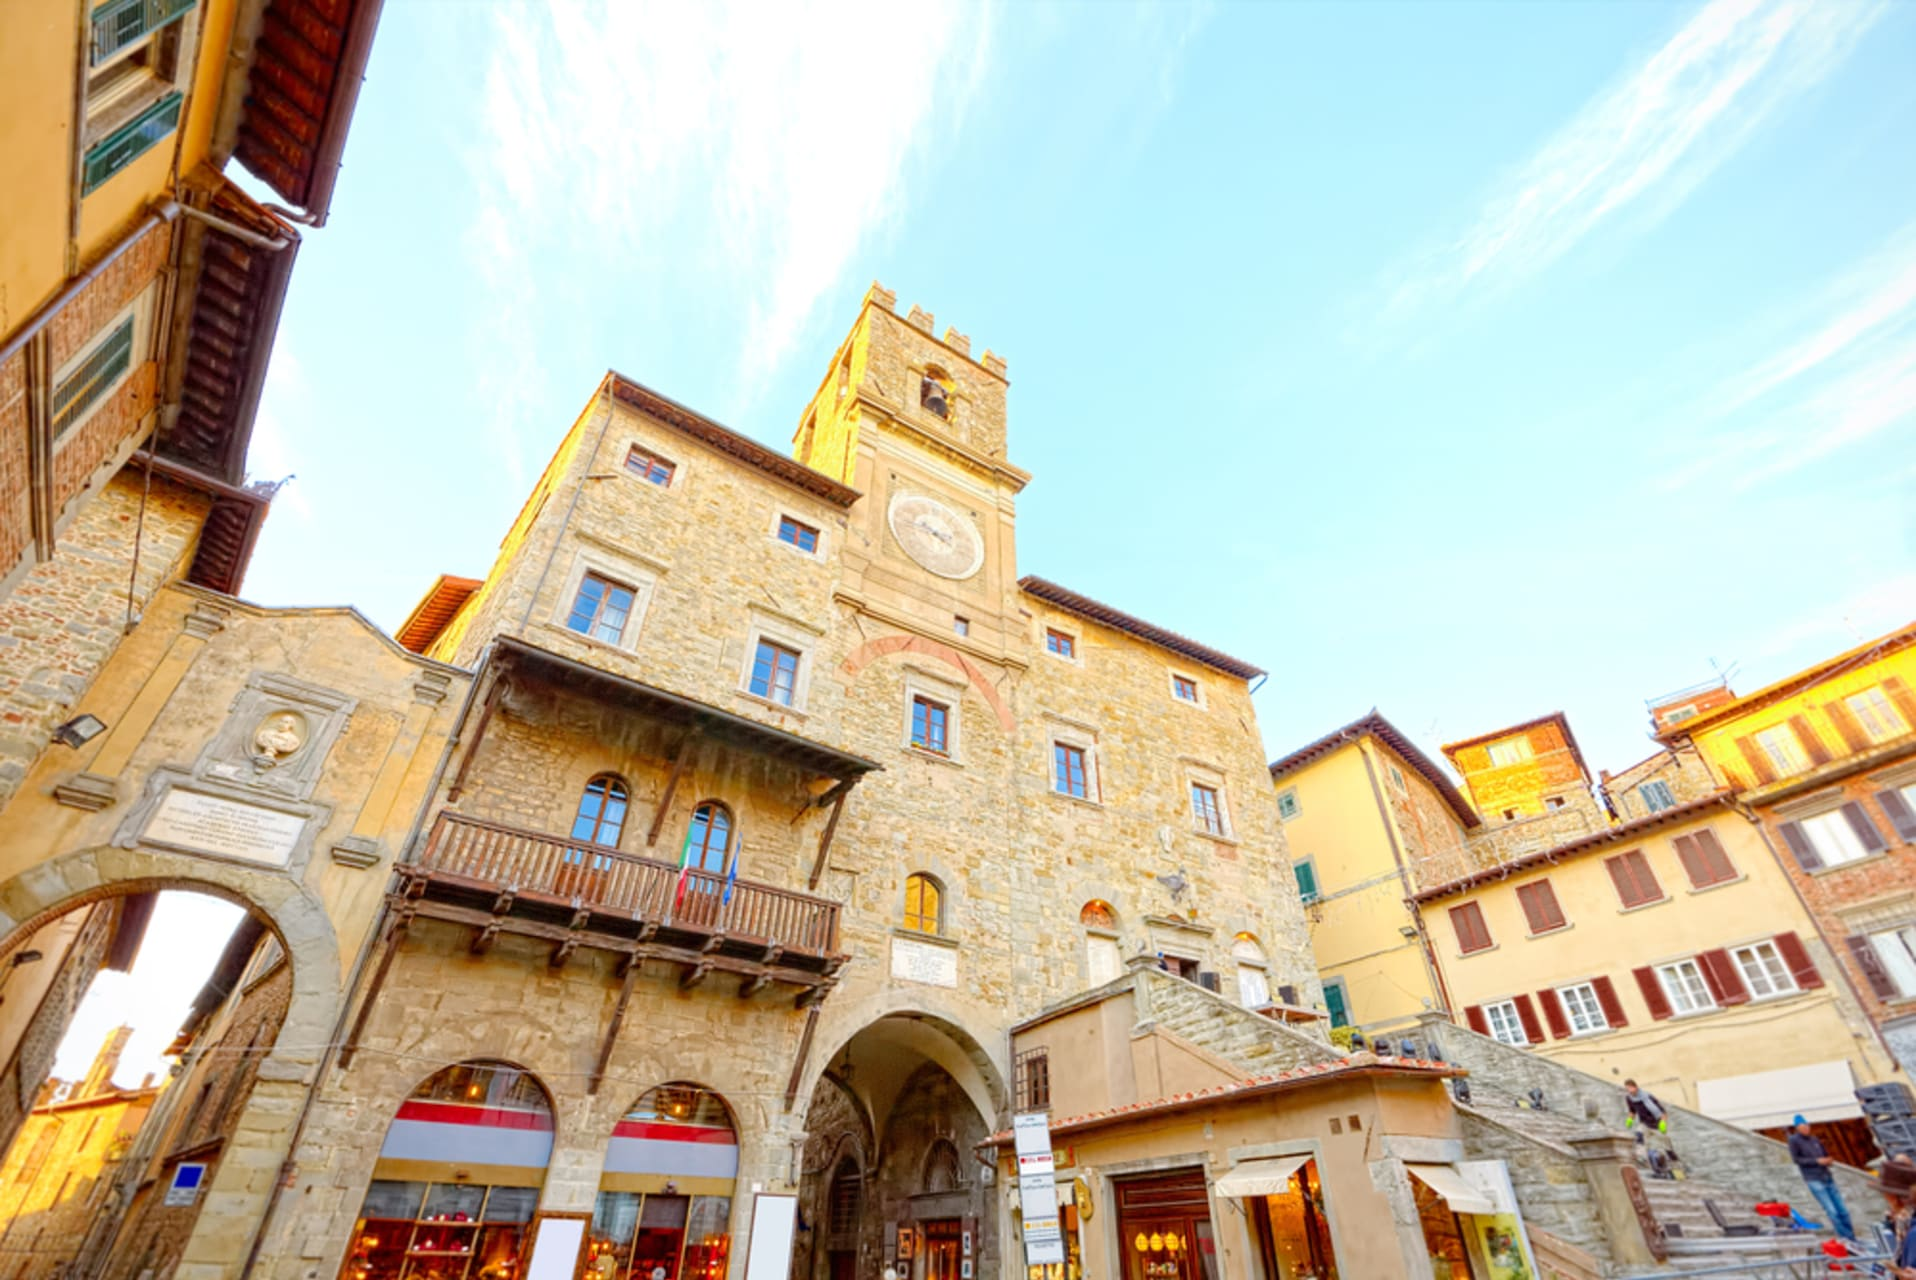 Tuscany - Under The Tuscan Sun: Cortona!